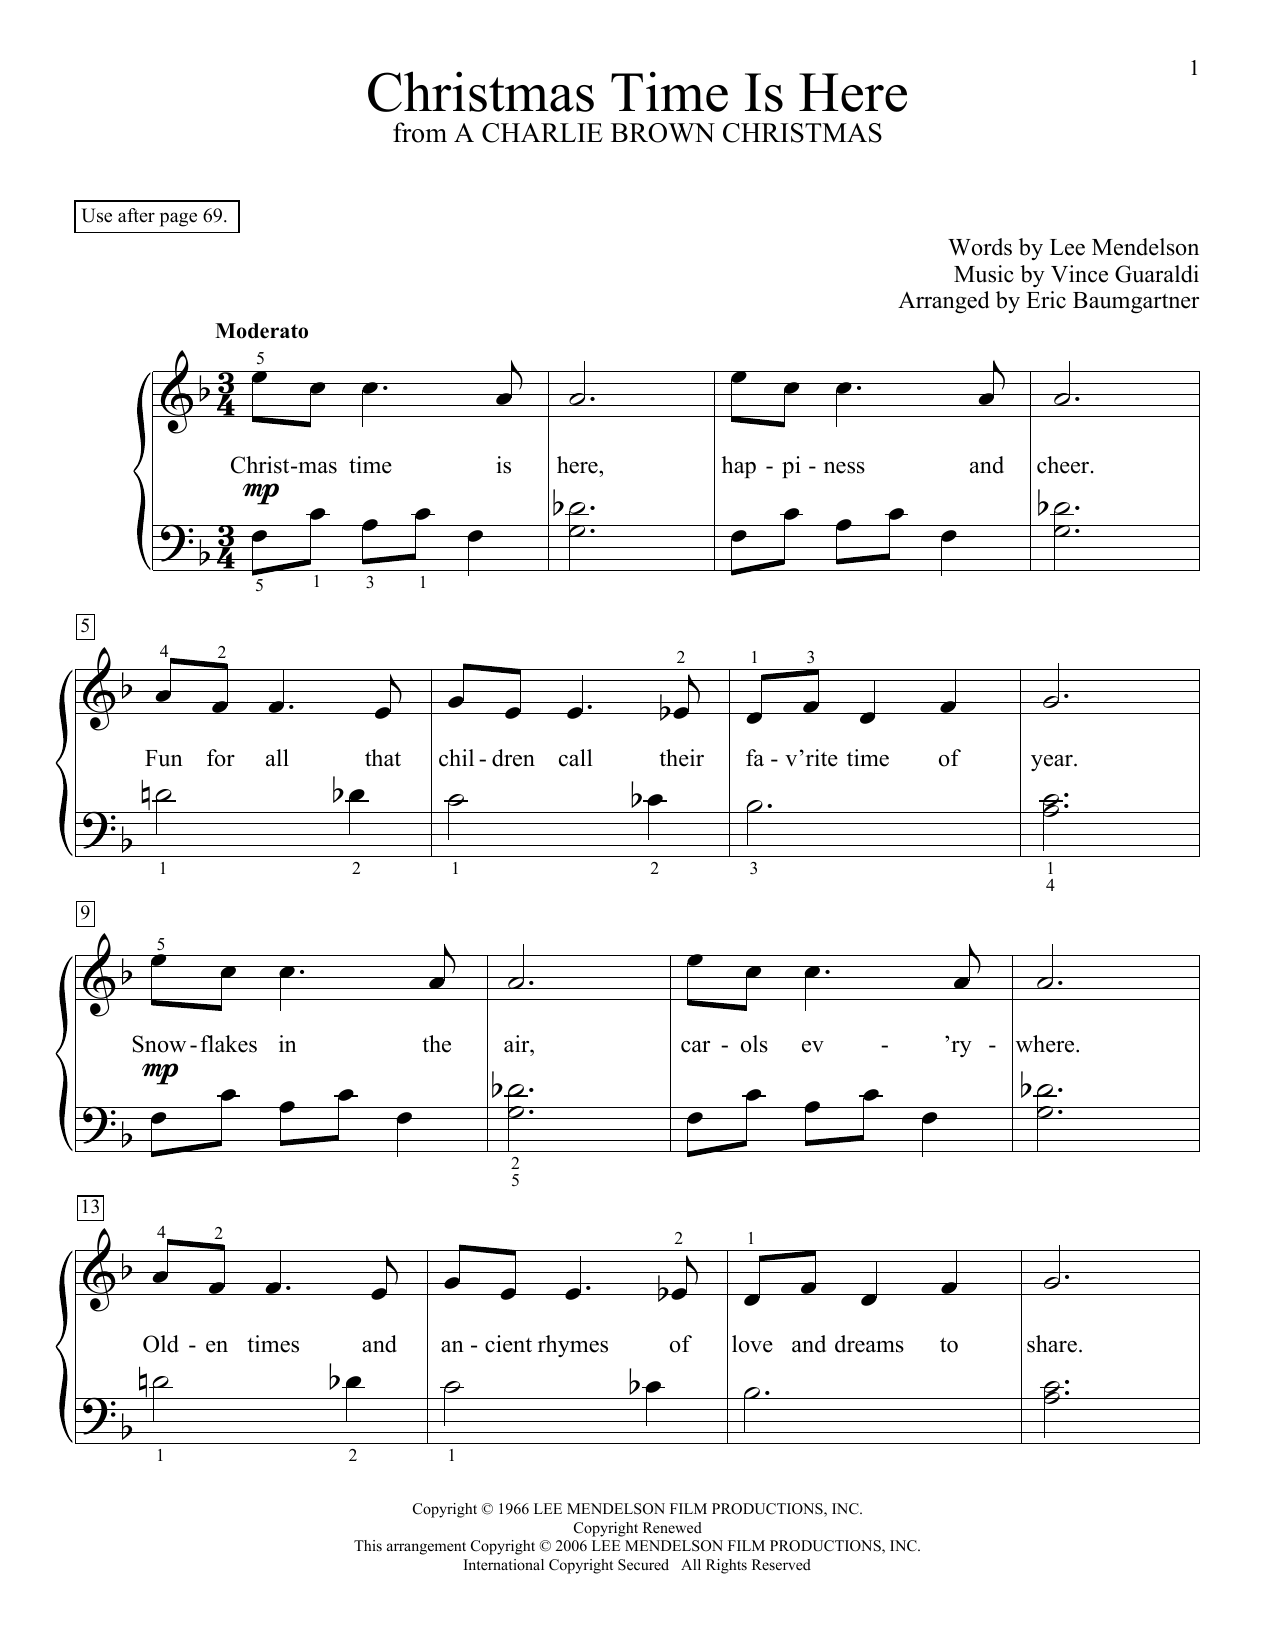 Guitar Chords Sheet Music Wonderful Christmas Time